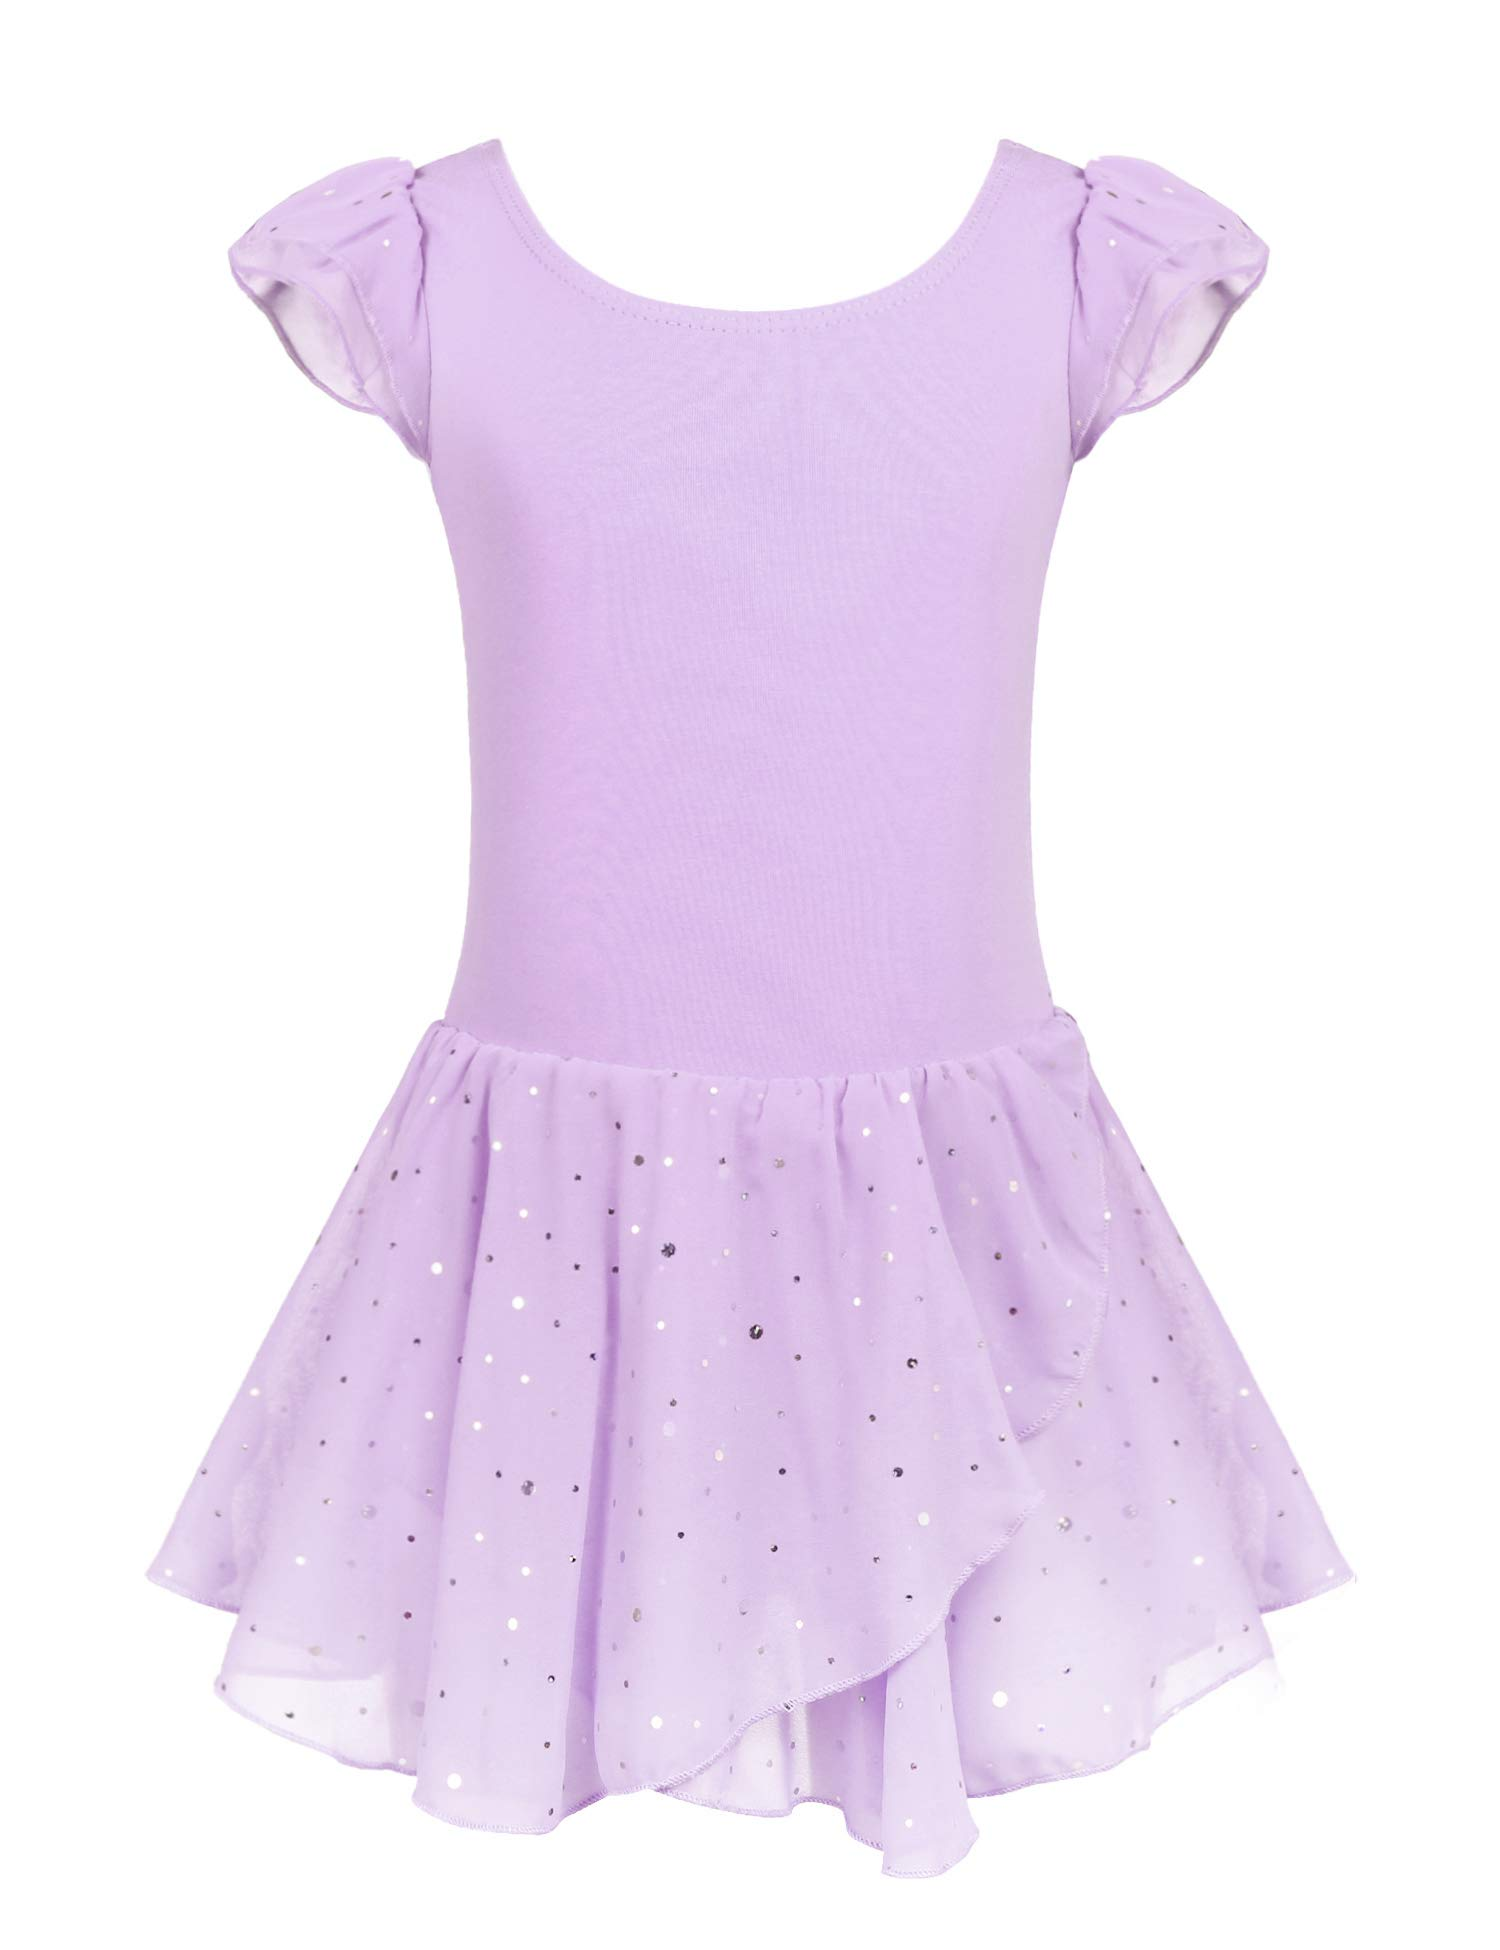 Arshiner Girls Ruffle Sleeve Ballet Dance Dress Tutu Skirted Leotard